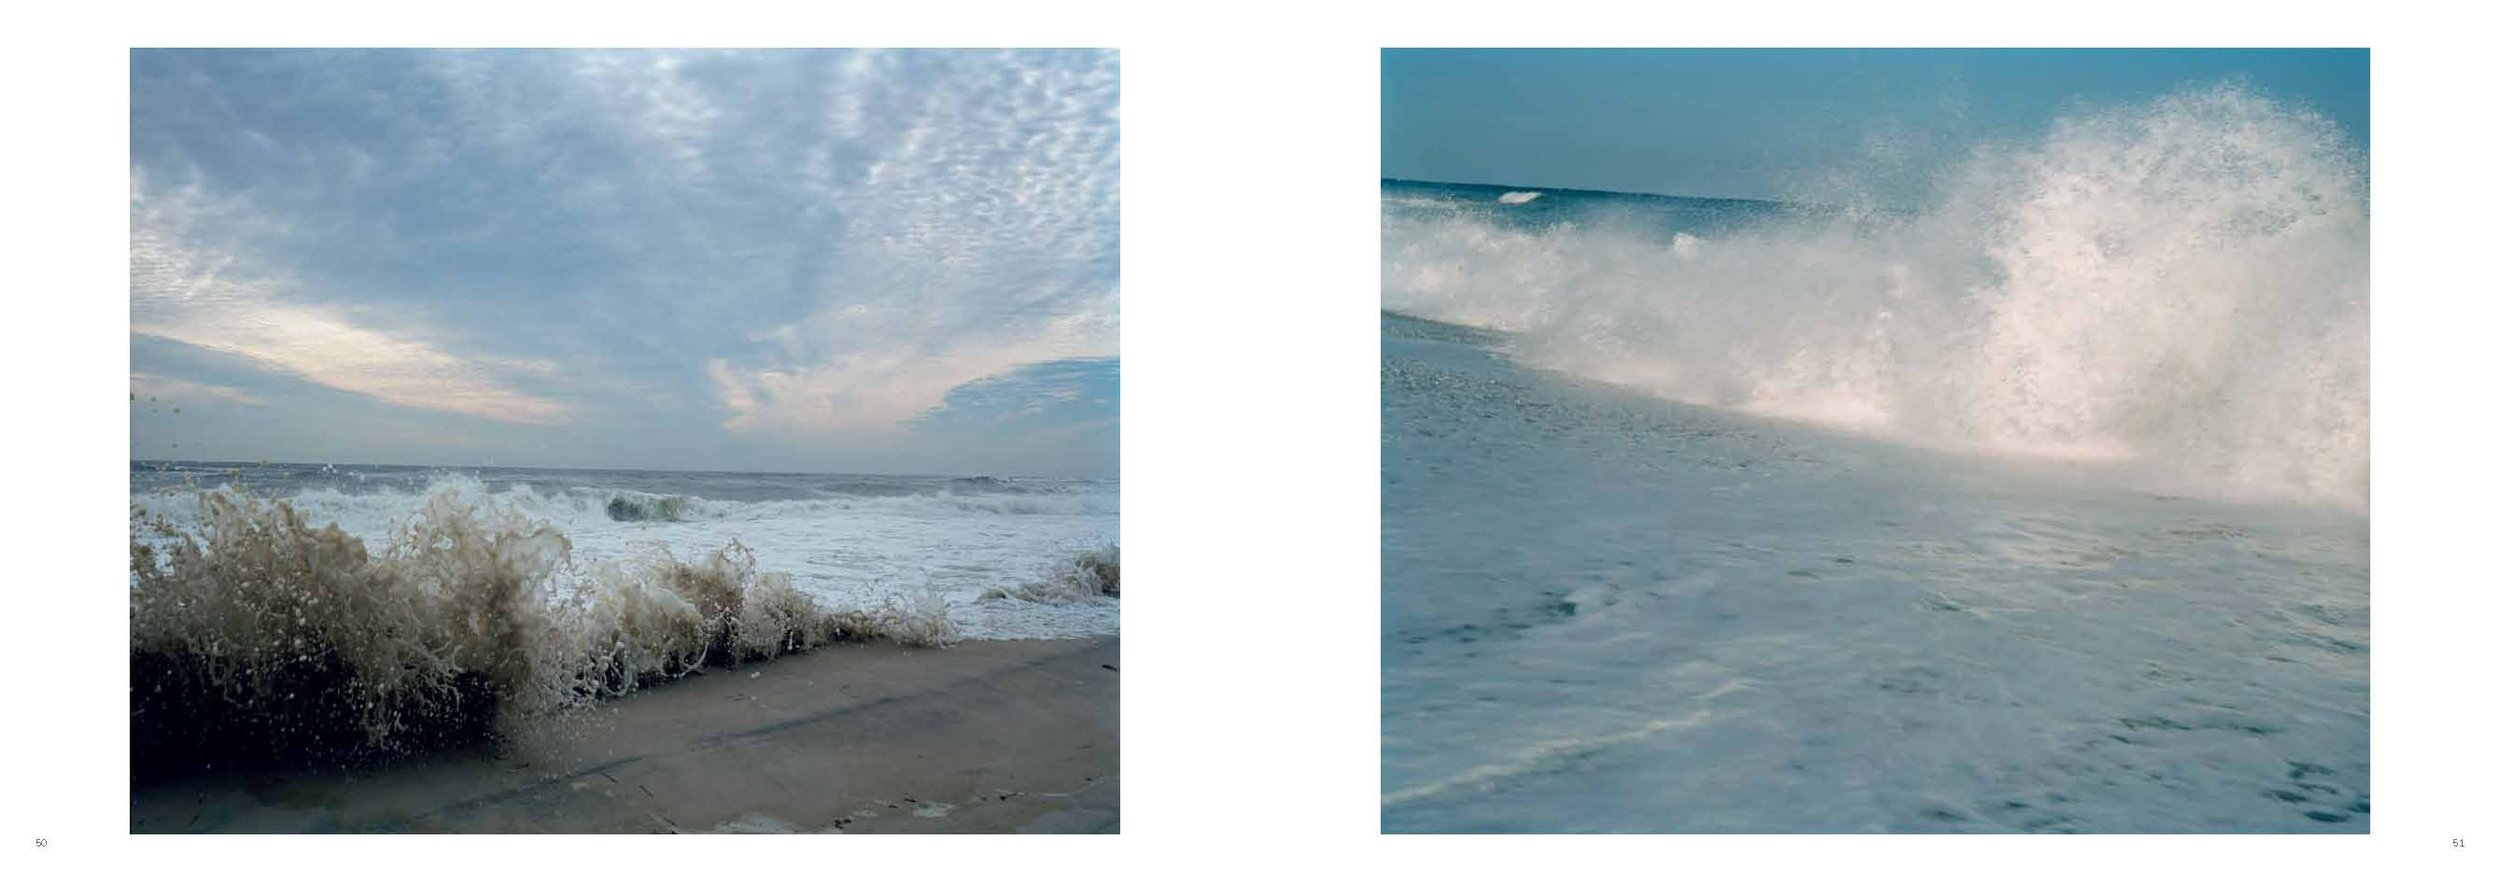 Sand_Sea_Sky_26.jpg